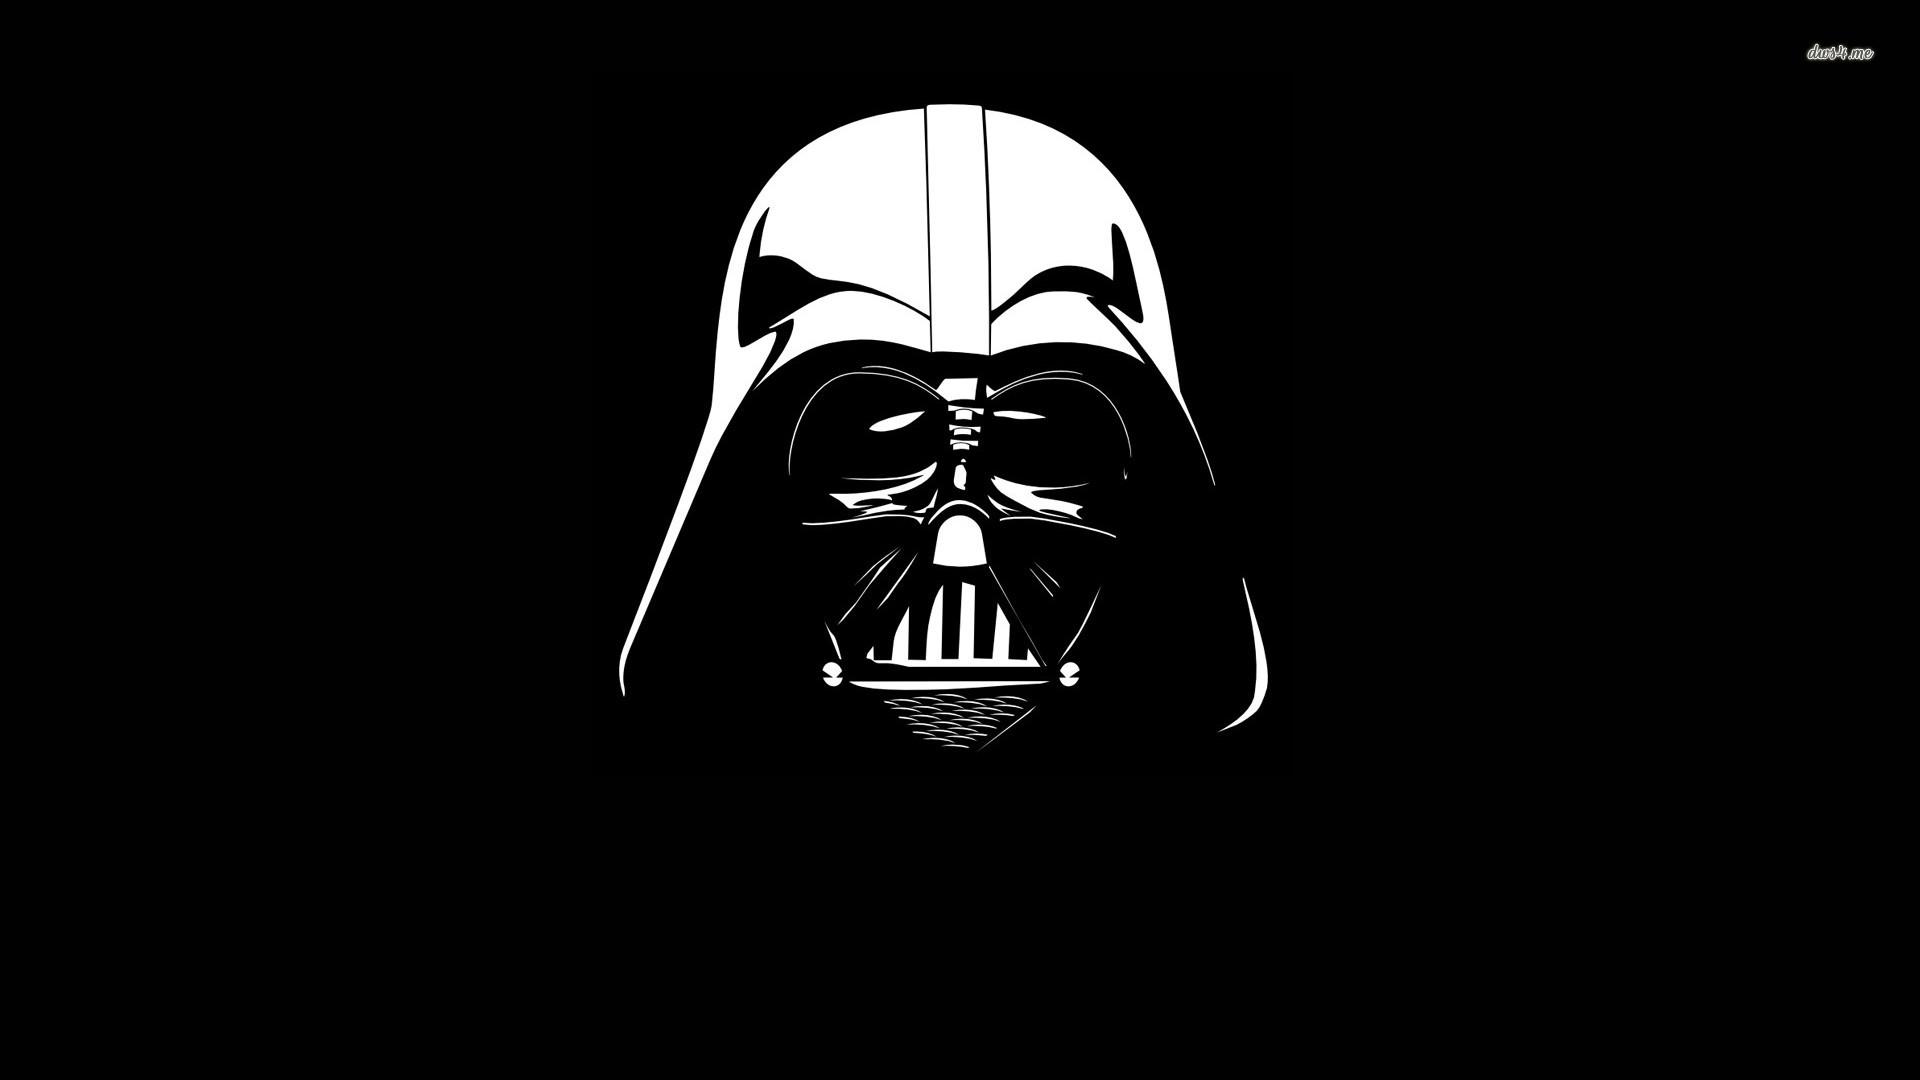 Darth Vader Fondo Pantalla Negro